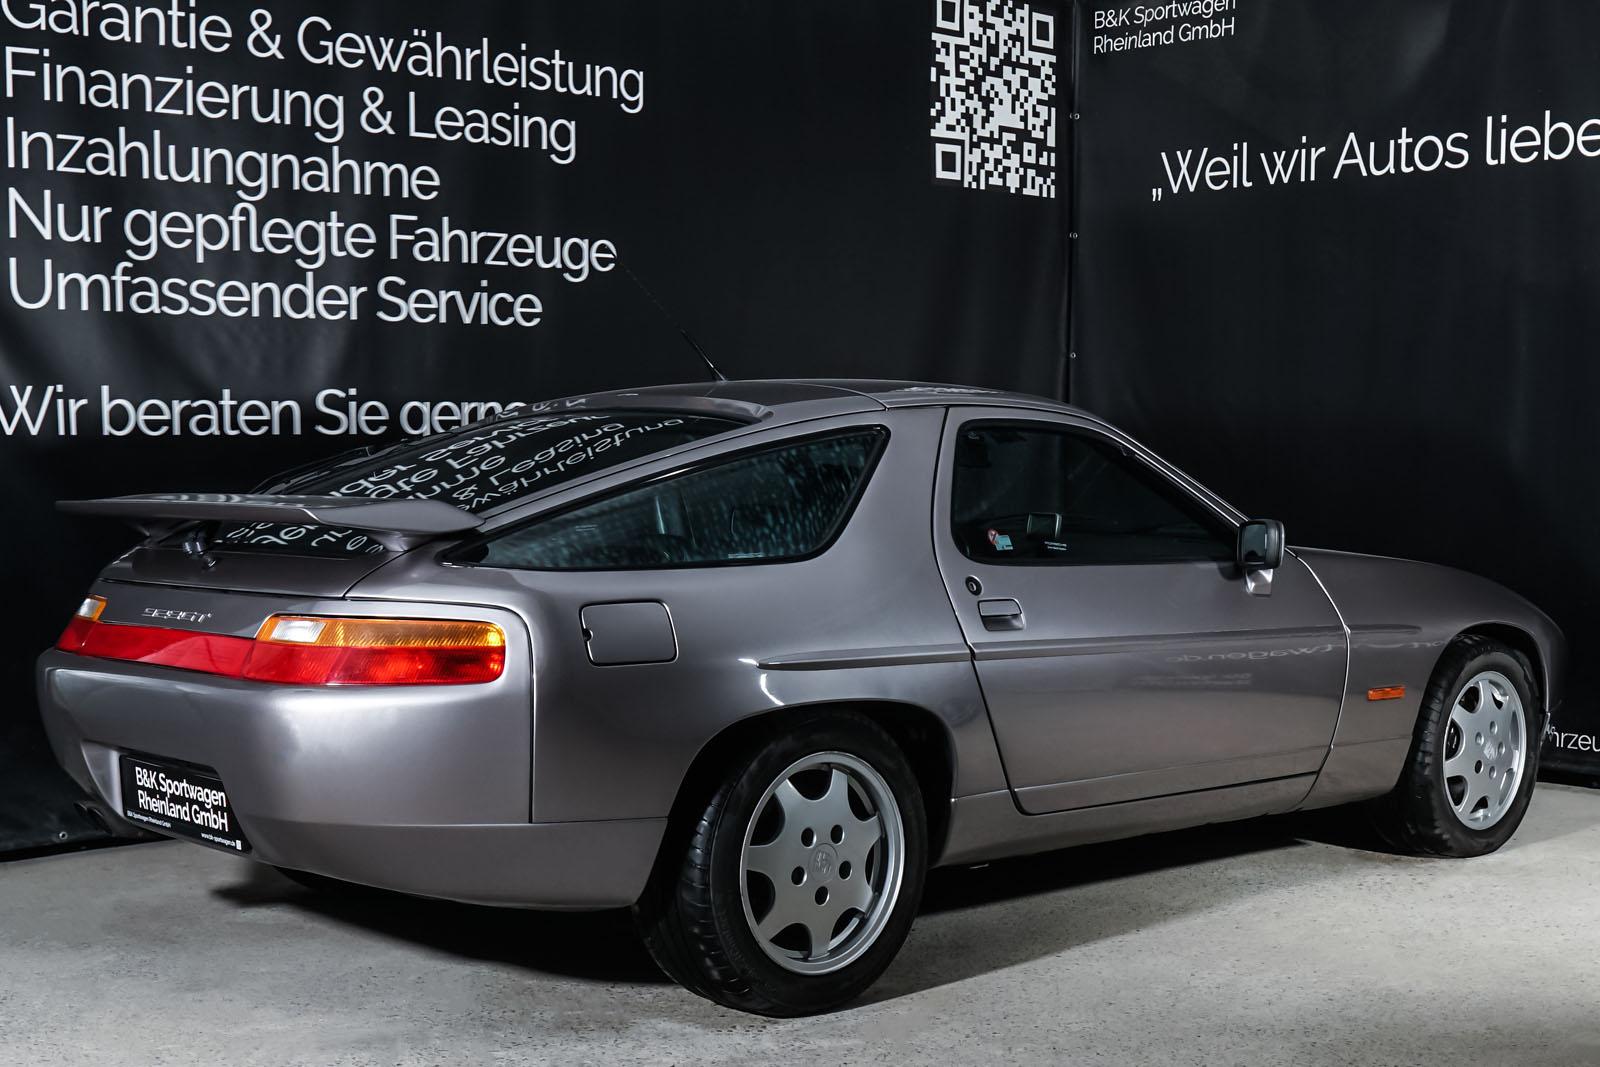 Porsche_928_Grau_Schwarz_POR-0325_14_w